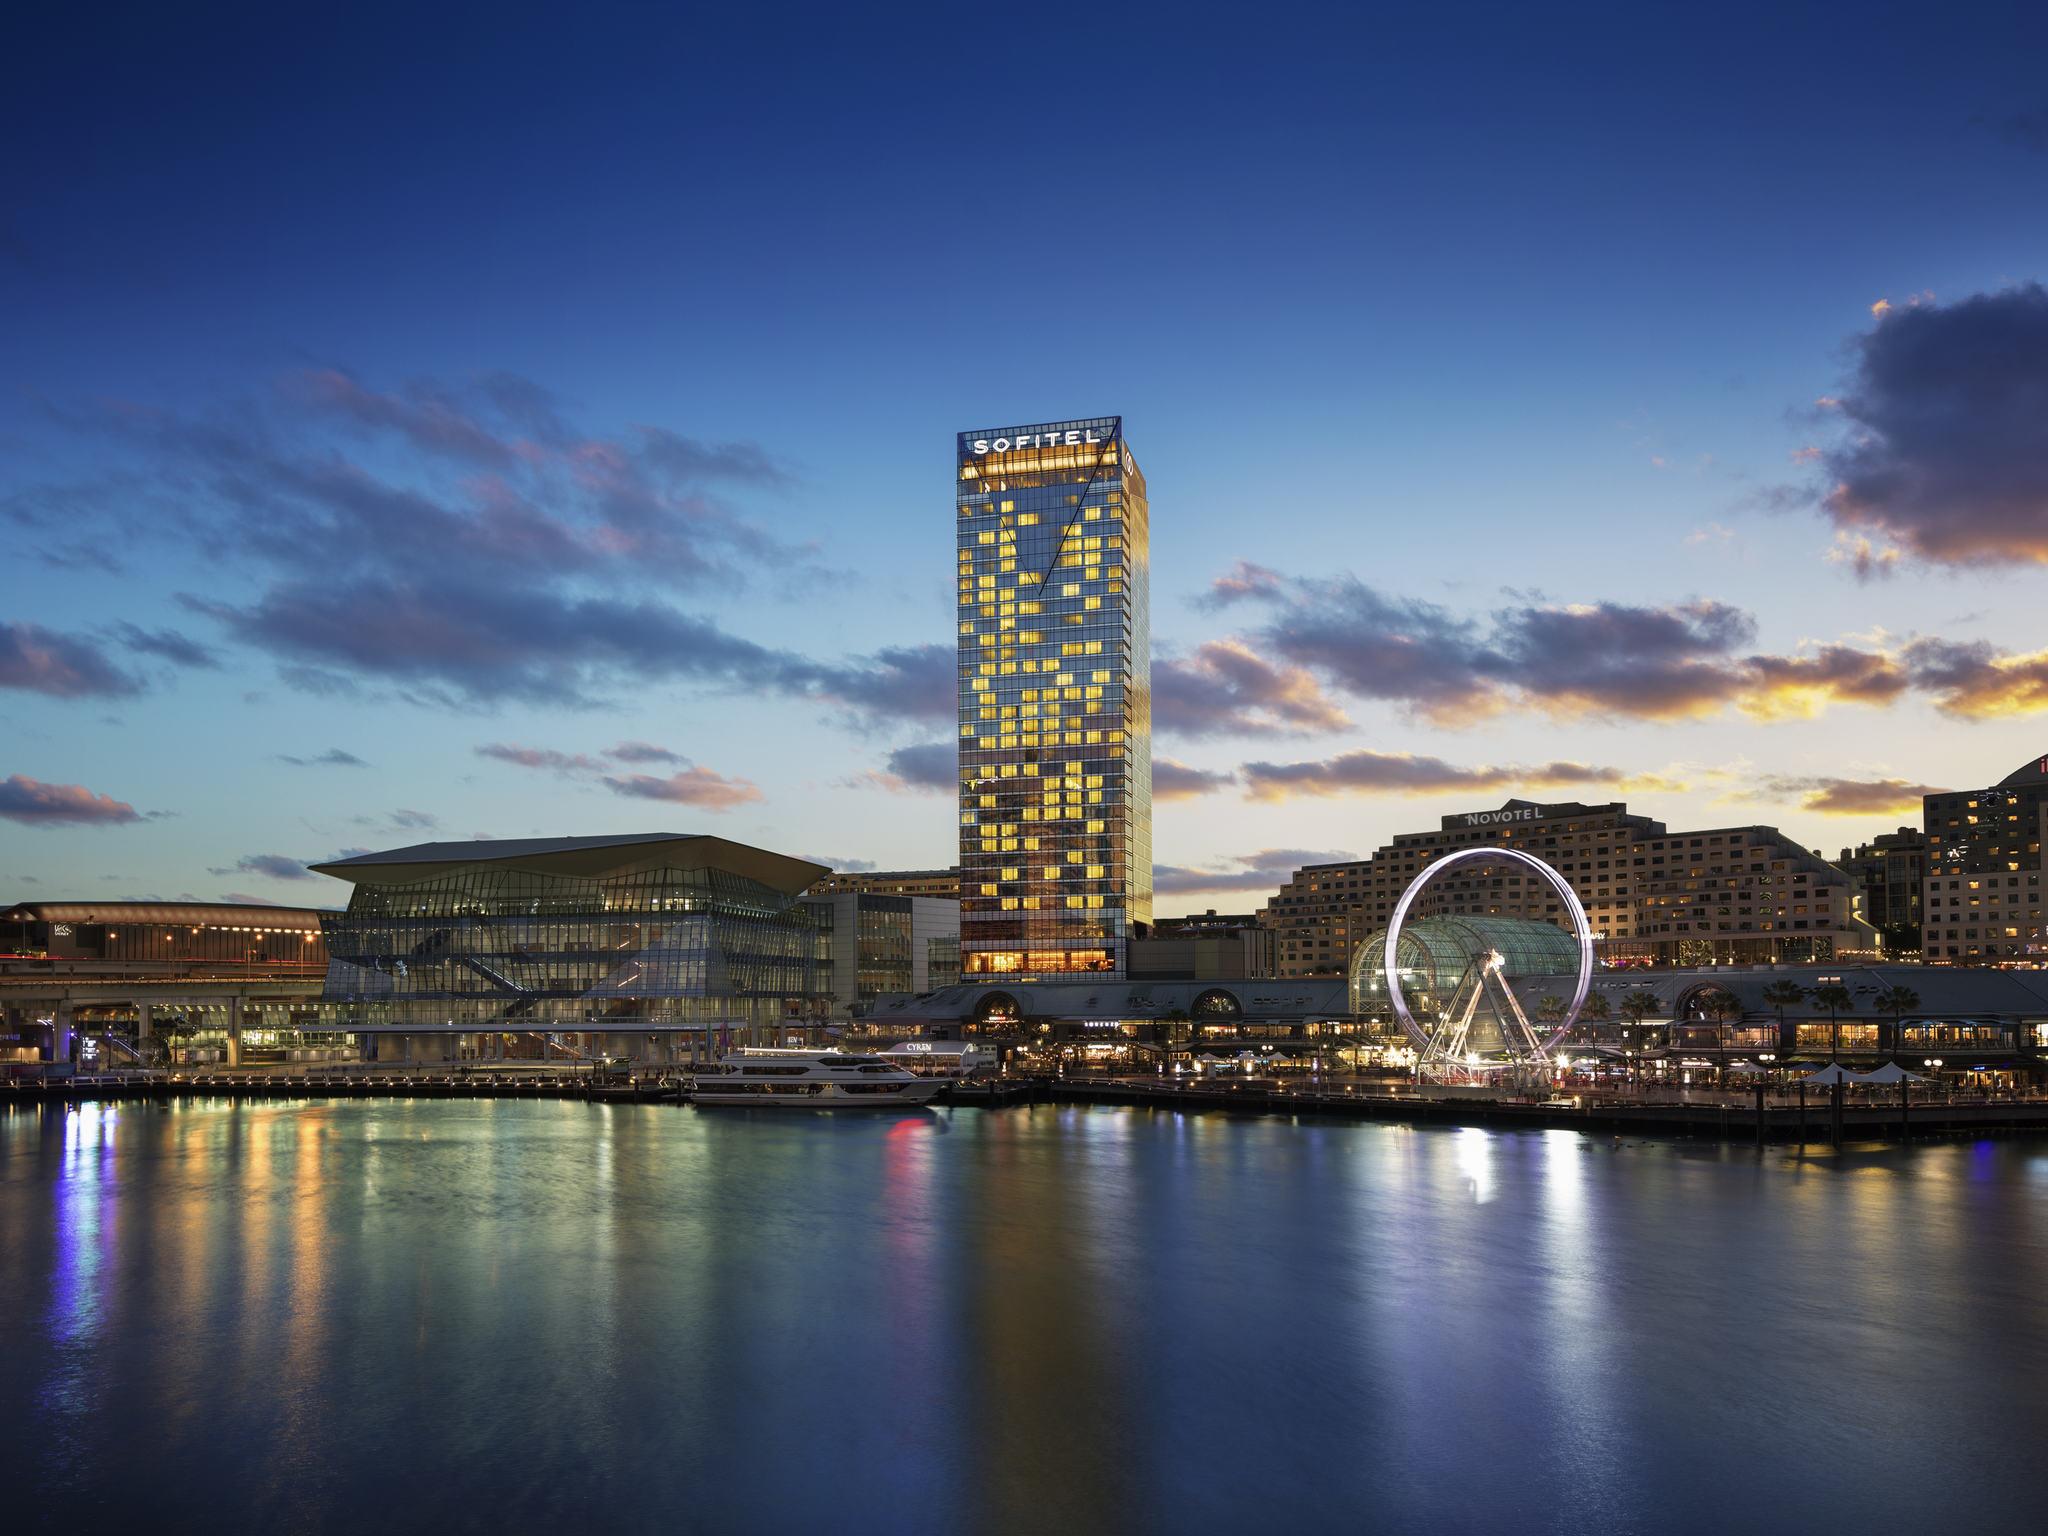 Hotel - Sofitel Sydney Darling Harbour